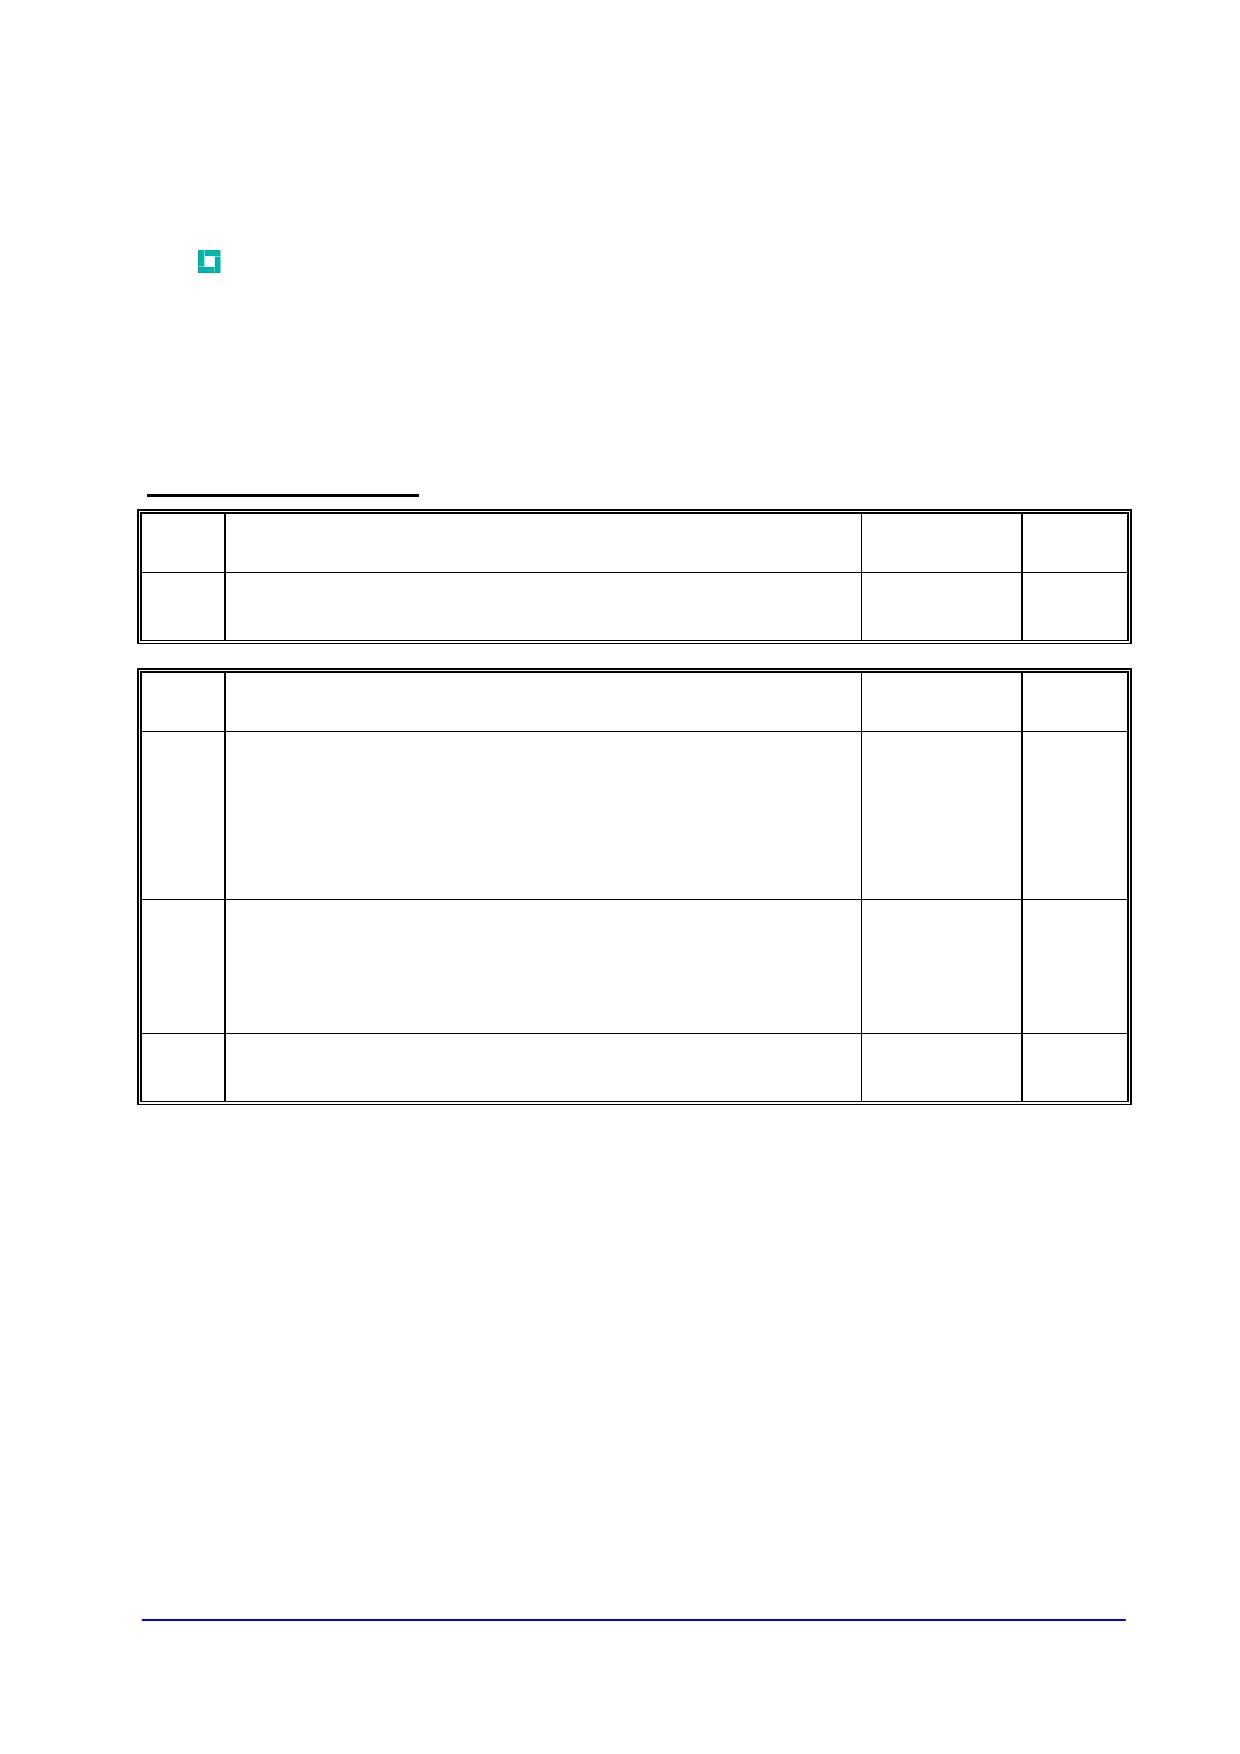 W4096ZT340 Datenblatt PDF